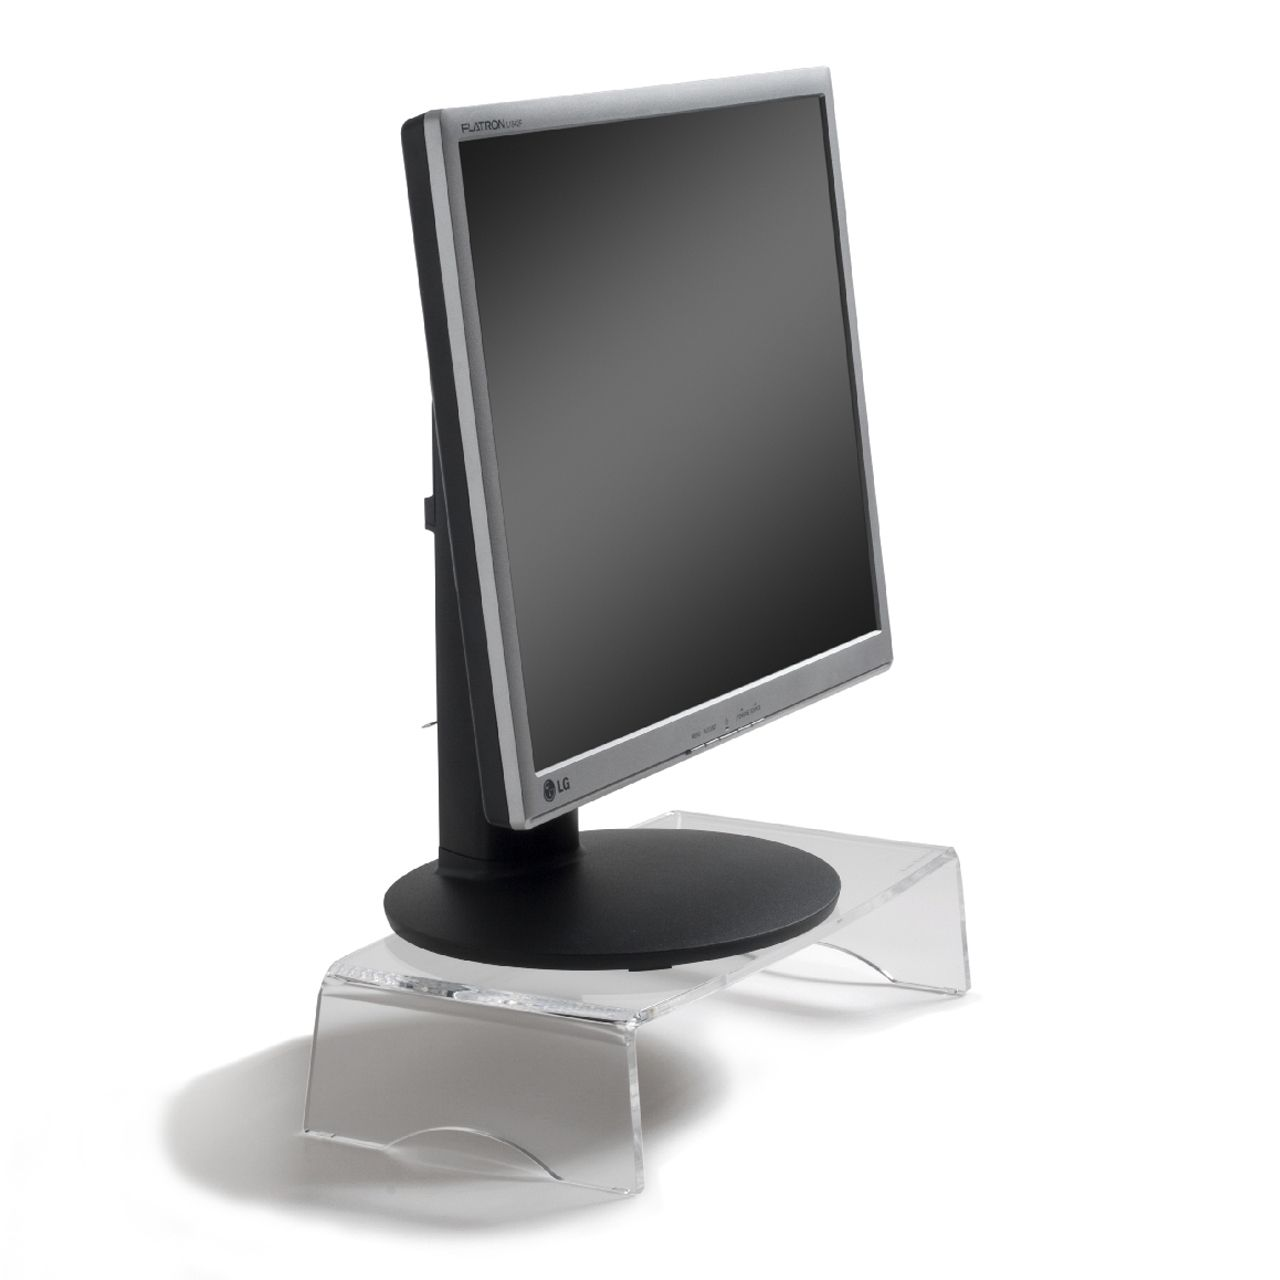 Q-riser-90-monitorsteun-erkaq090_0000s_0000s_0001_met_monitor